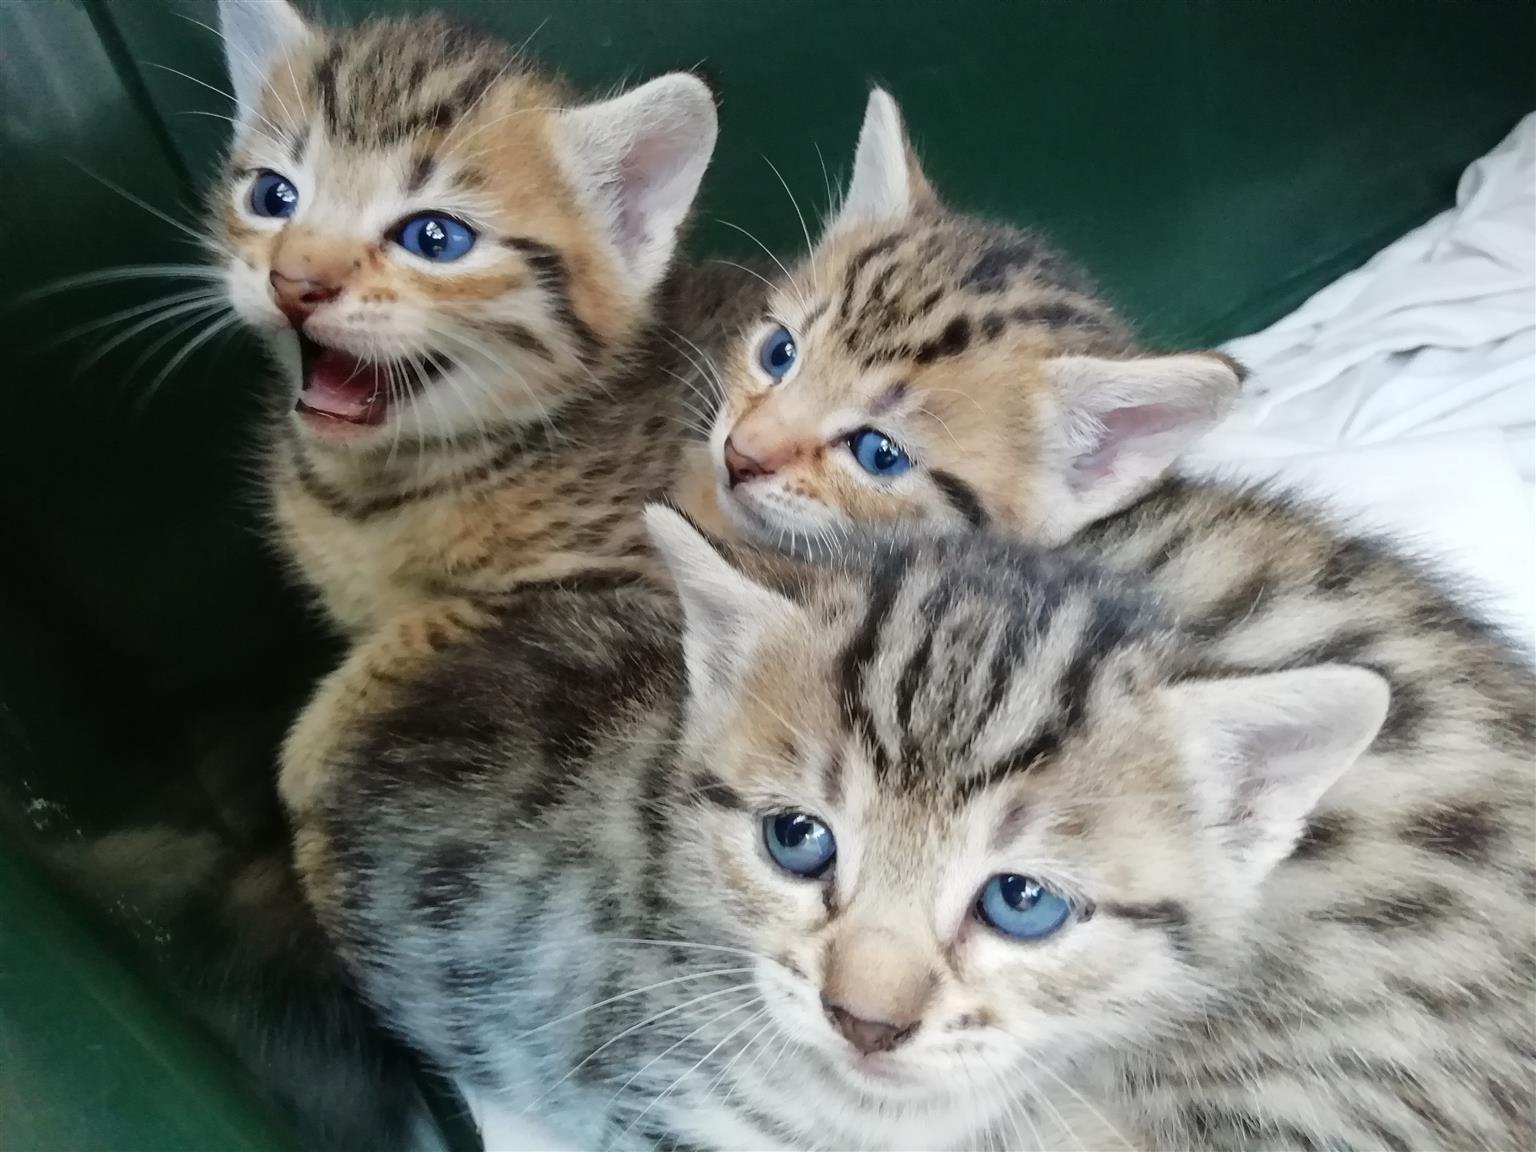 Blue Eyed Kittens for Sale